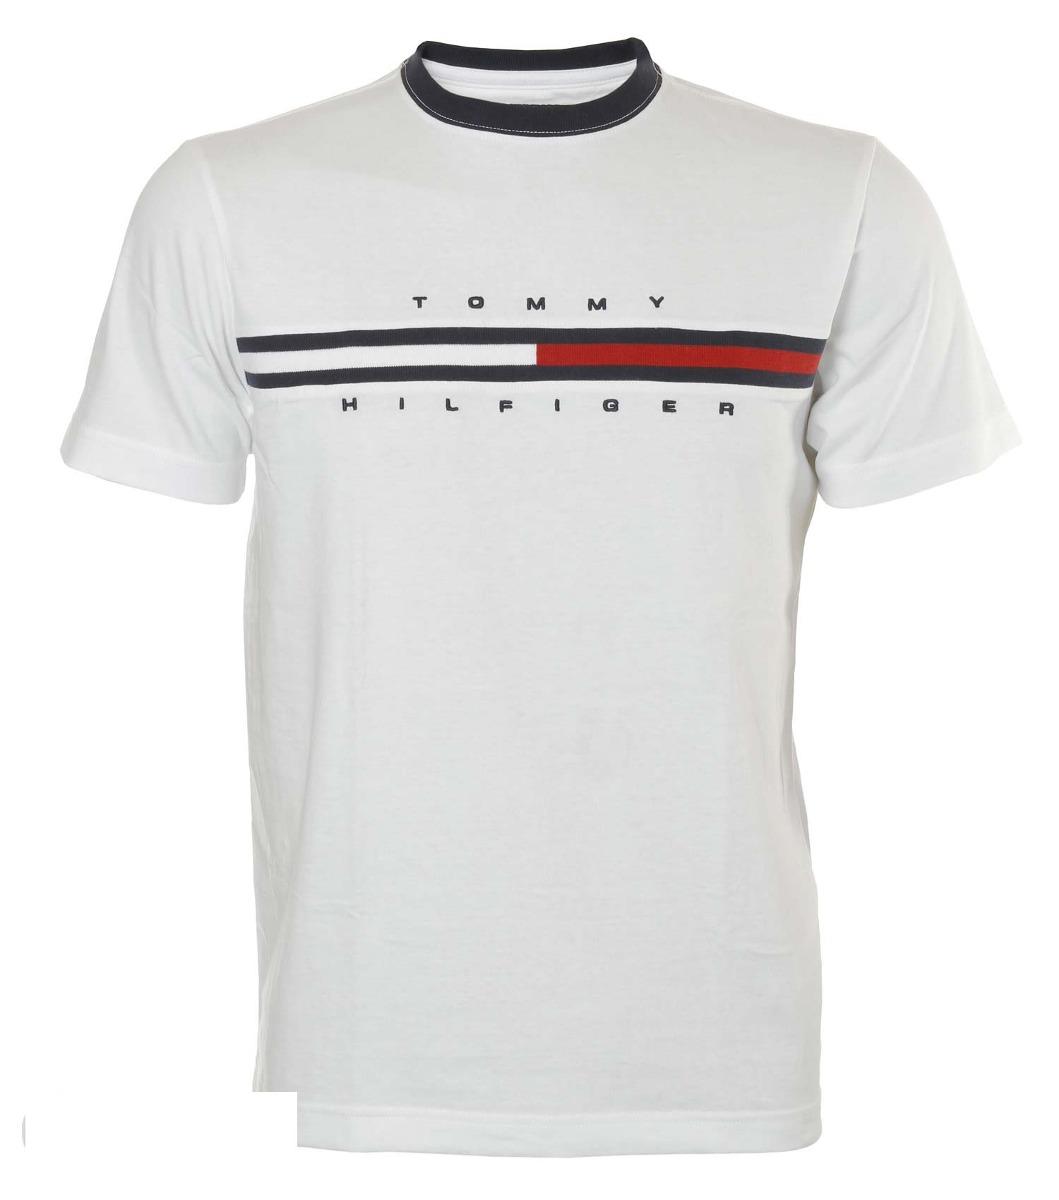 6cadc52db180e7 Camiseta Masculina Tommy Hilfiger Goya - R$ 144,33 em Mercado Livre